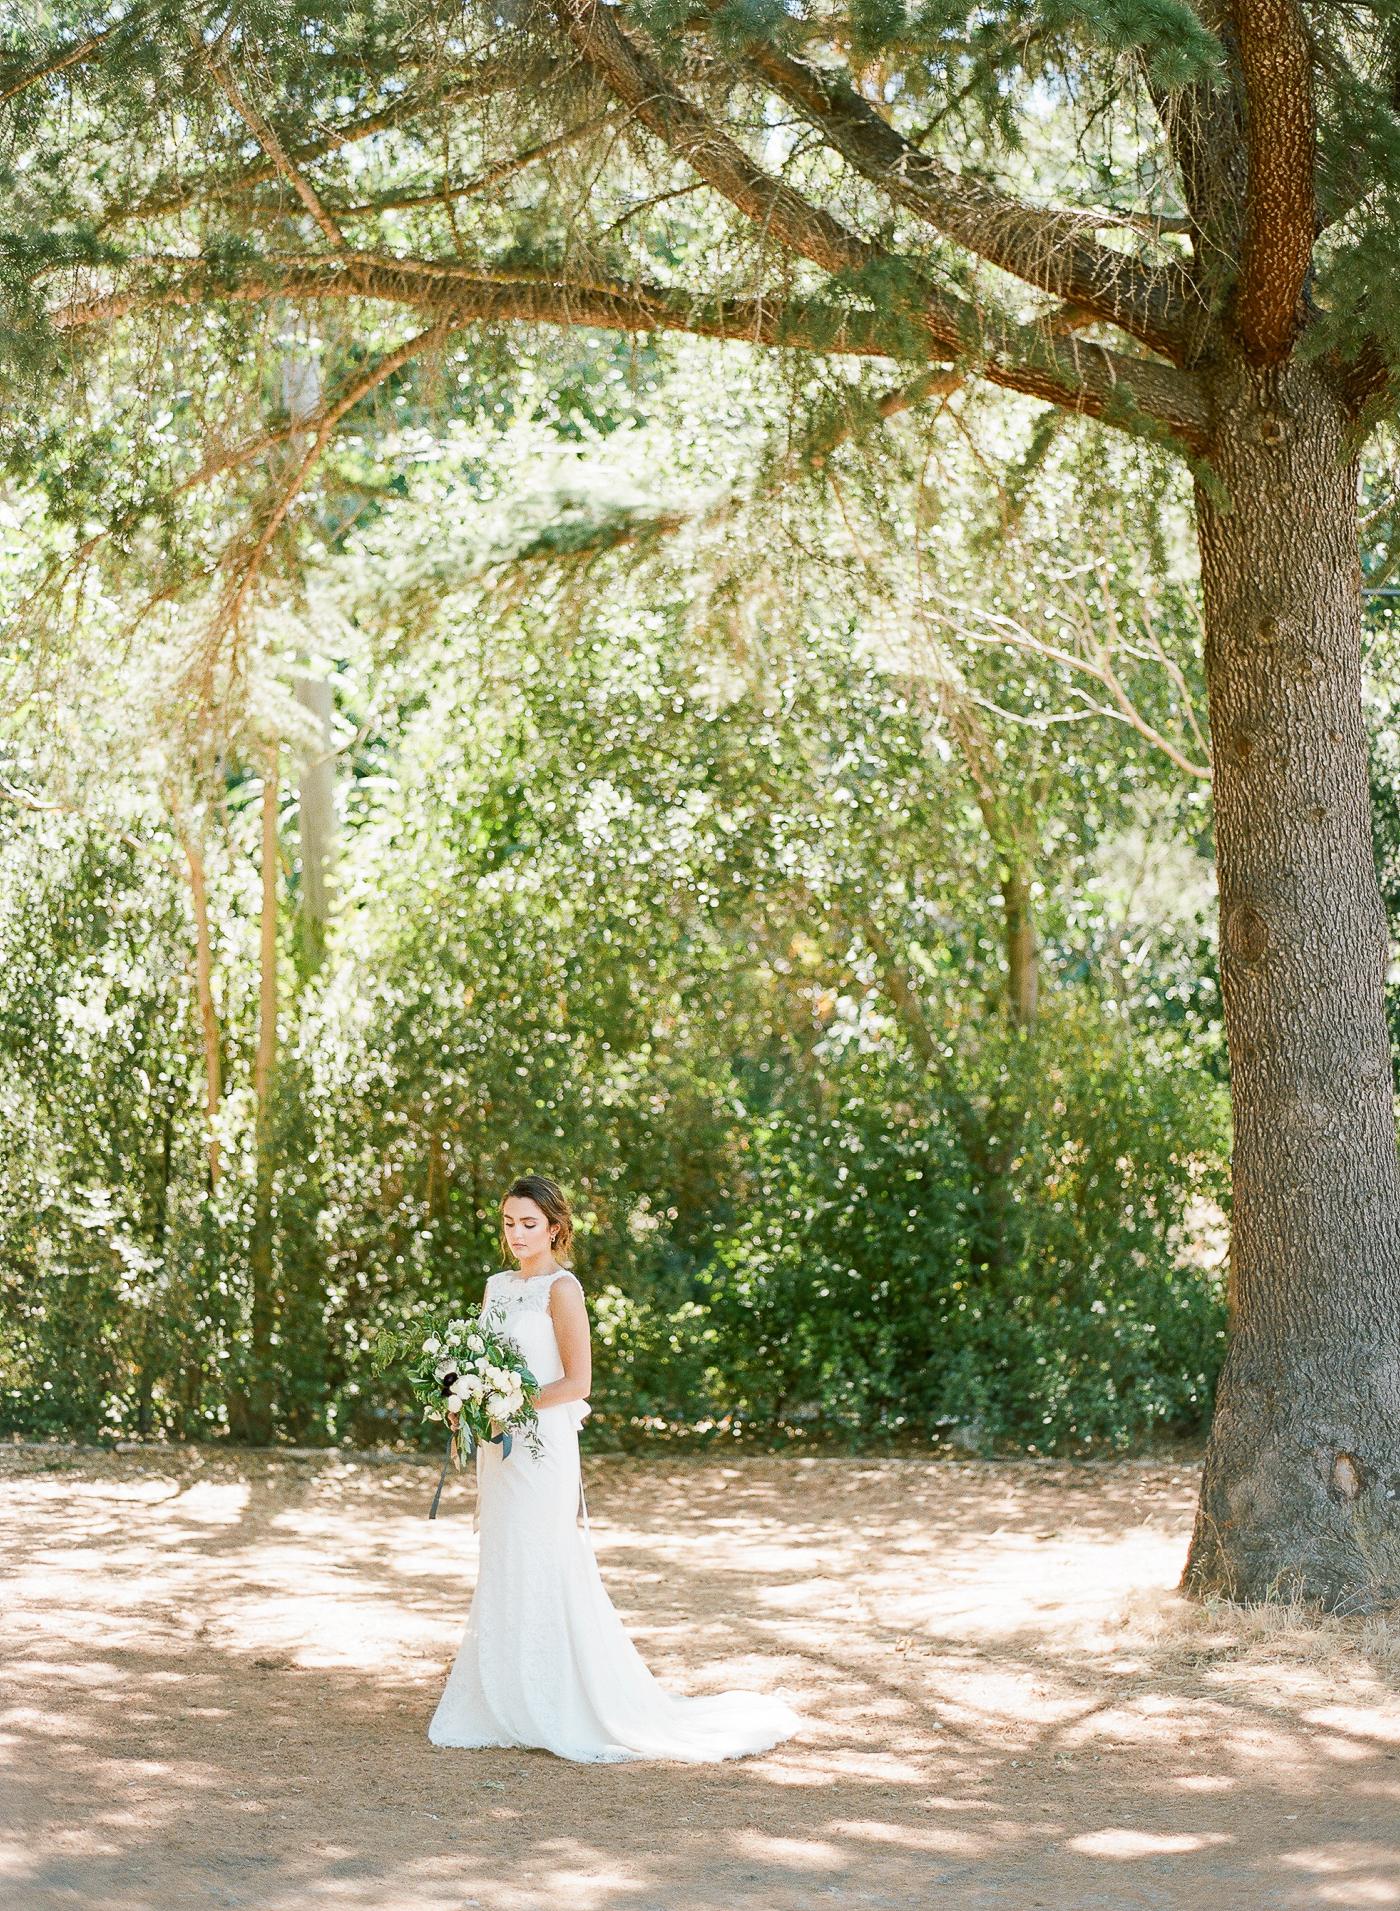 Vineyard Wedding Inspiration | Blue and Yellow Wedding | Bright and Colorful Wedding Inspiration | The Ganeys | Fine Art Wedding blog | Canadian Wedding Blog | Joy Wed